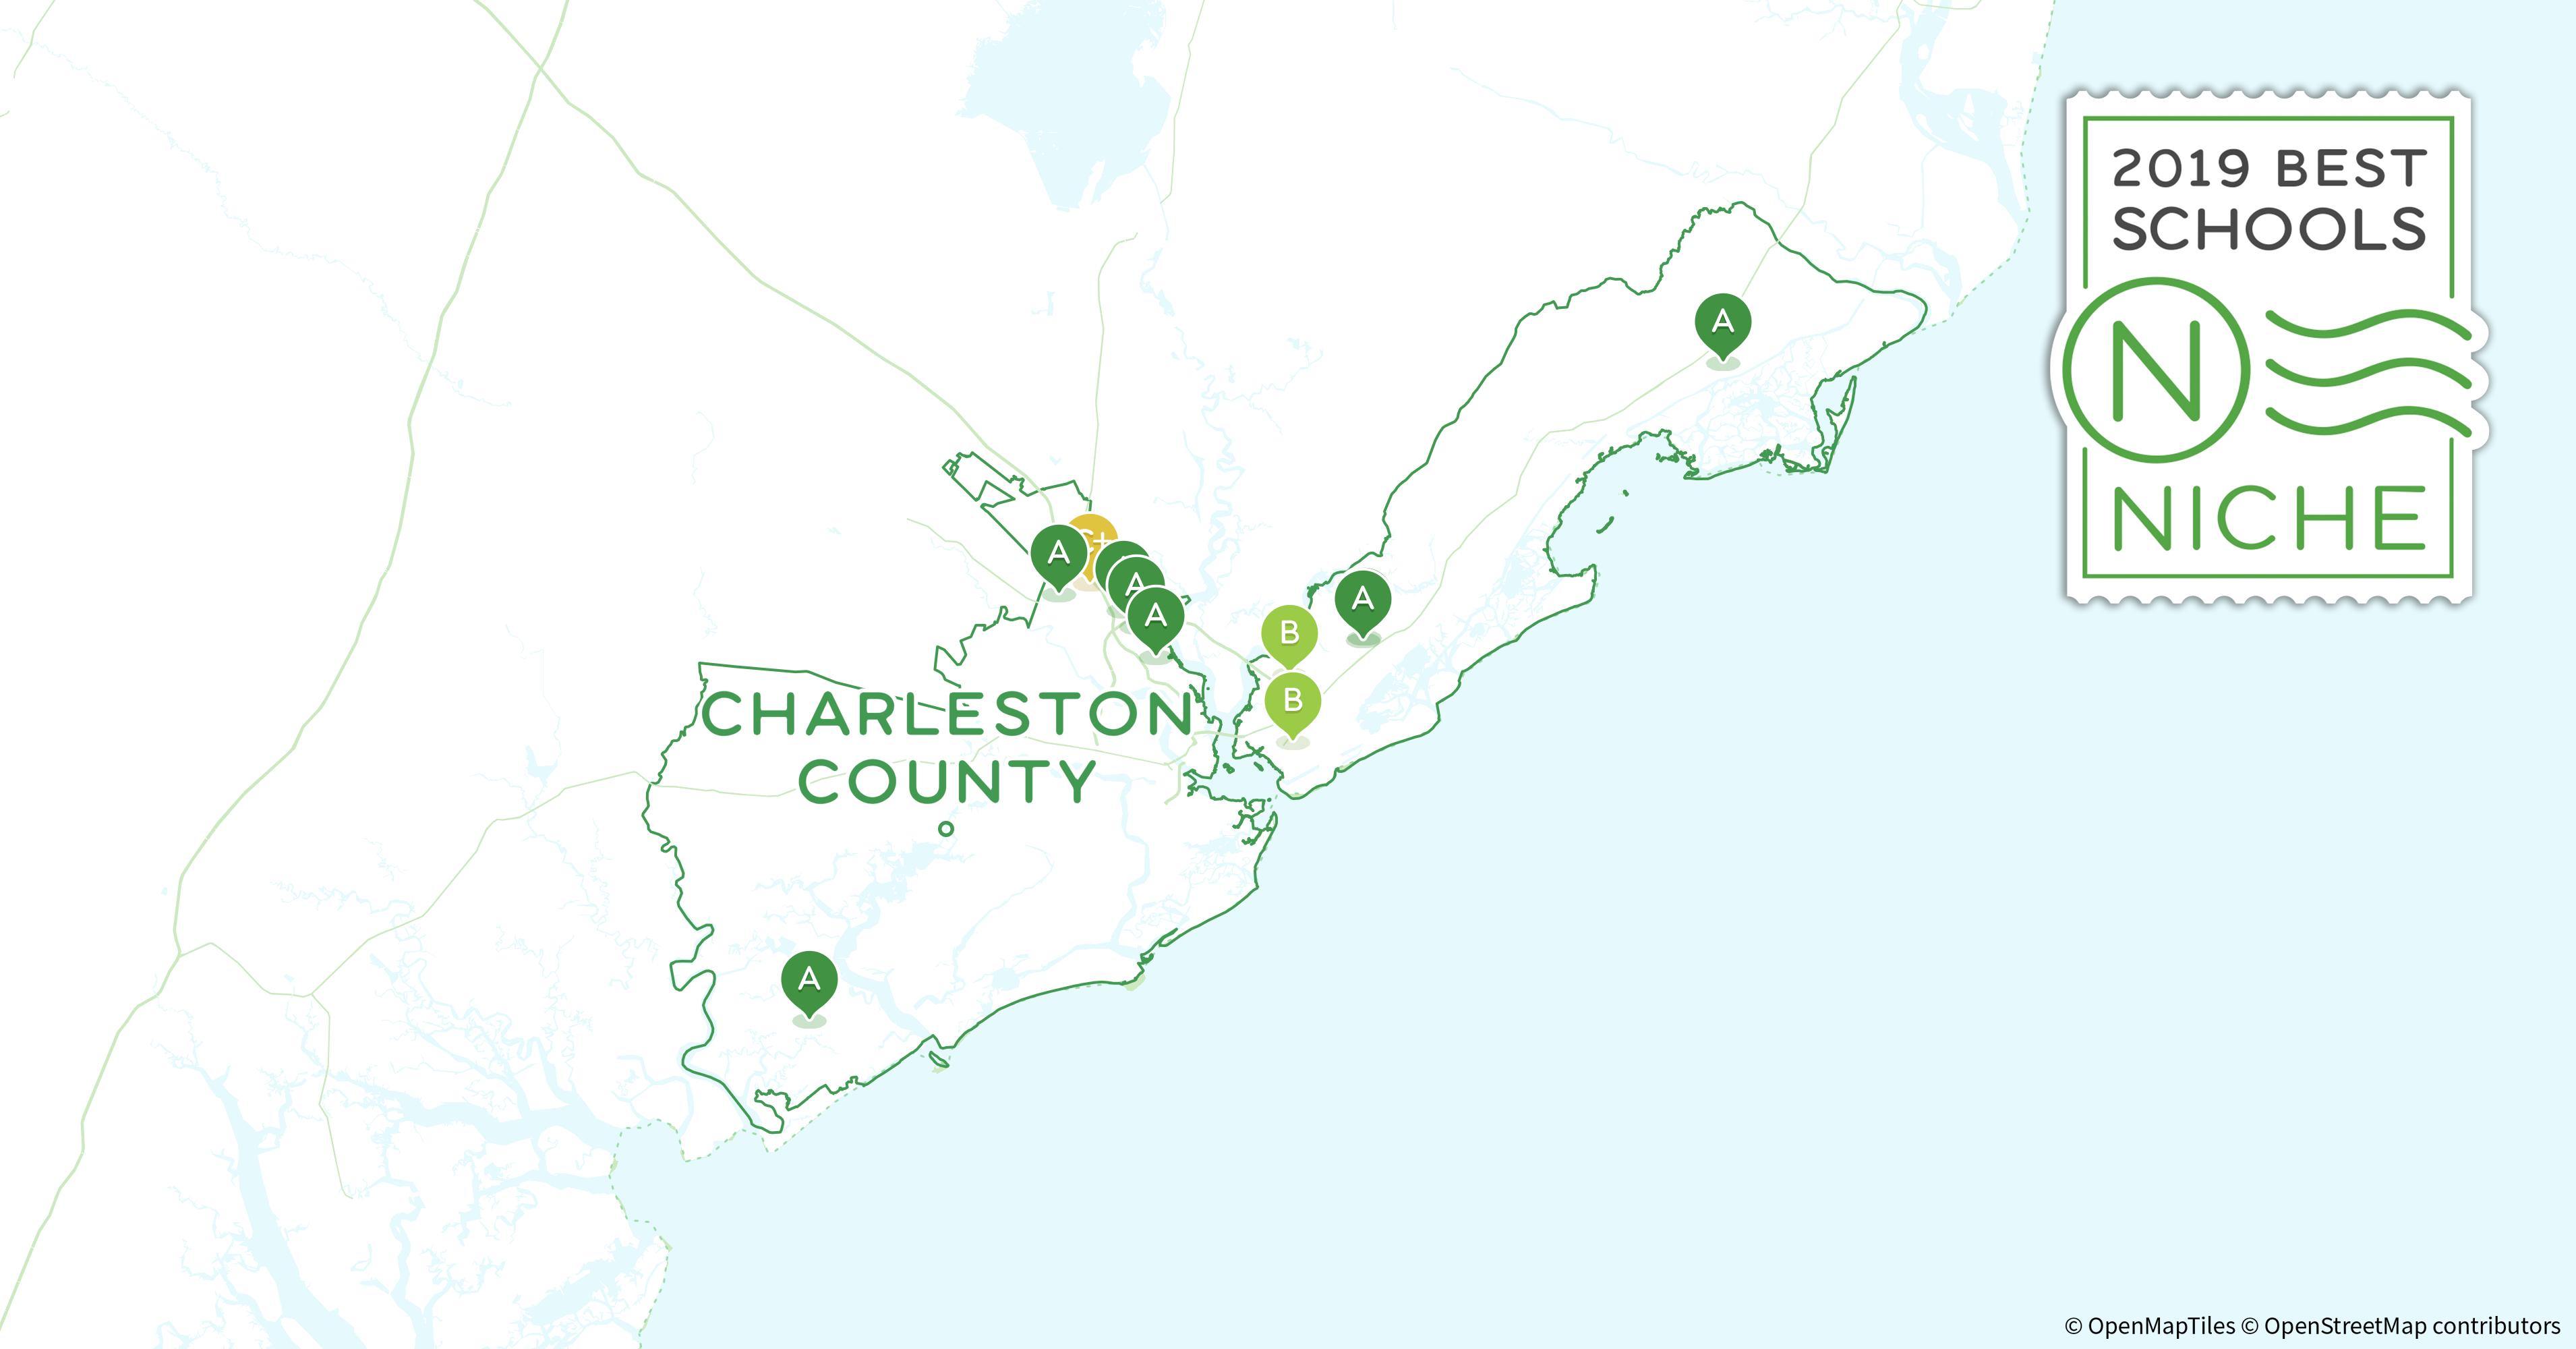 Mount Pleasant Sc Zip Code Map.2019 Best Private High Schools In Charleston County Sc Niche